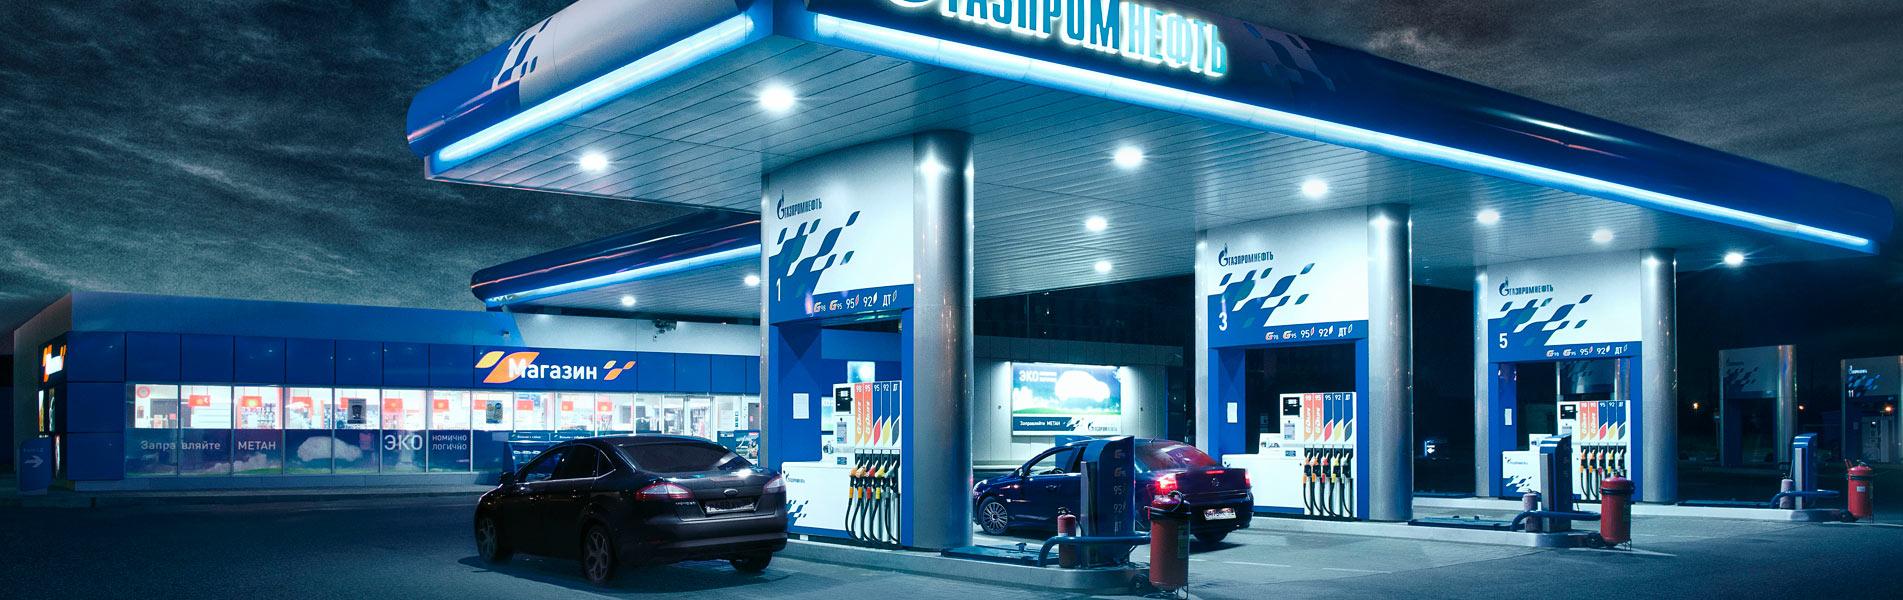 gazprom-neft-fon2